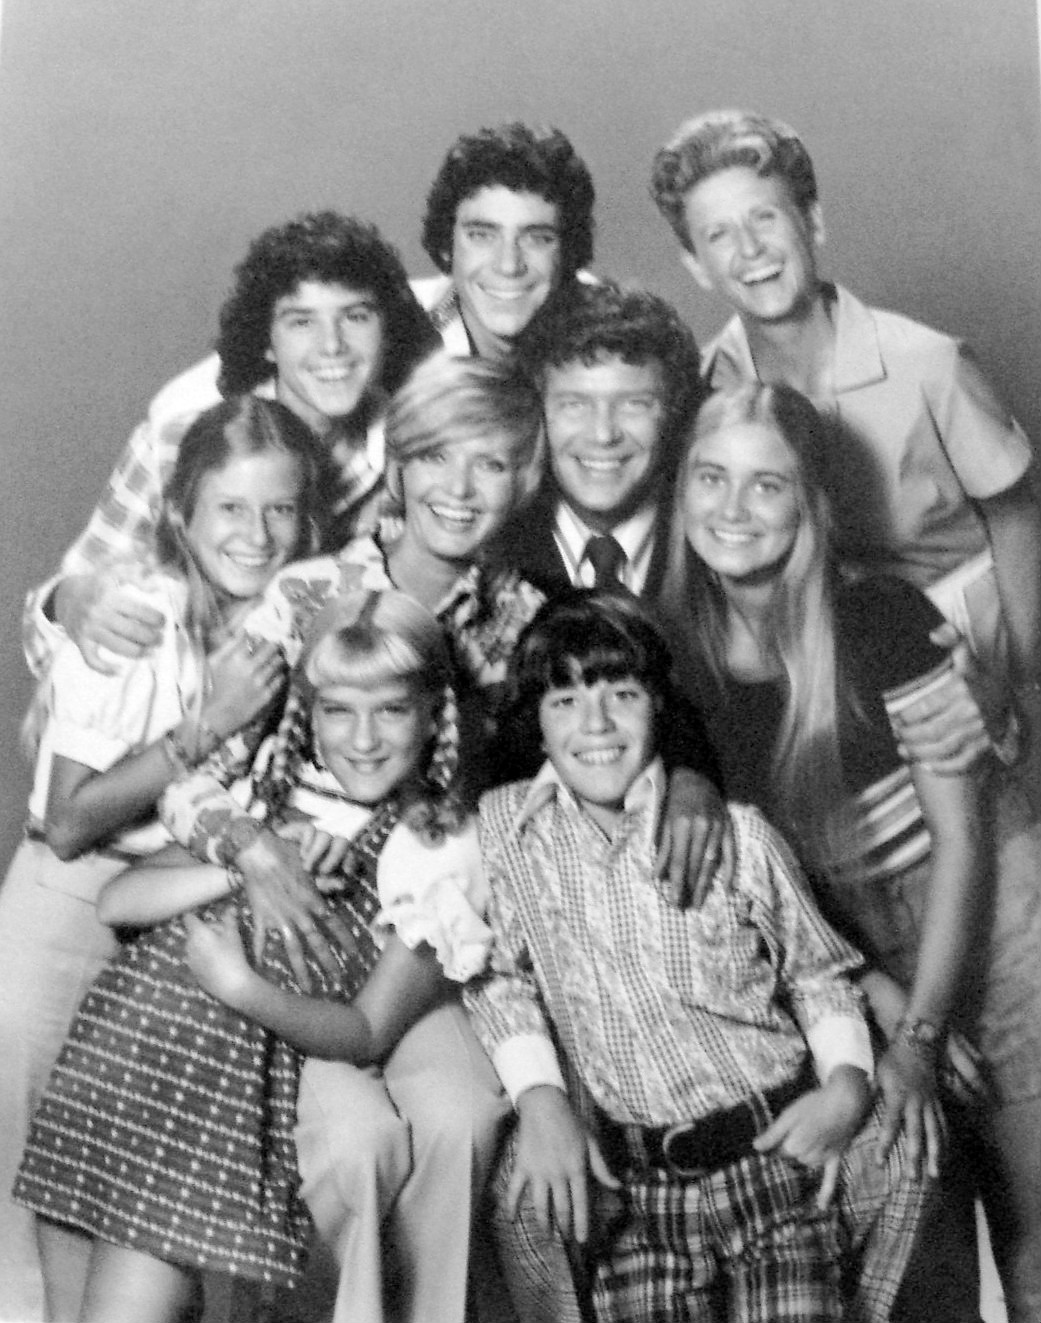 brady-bunch-full-cast-1973